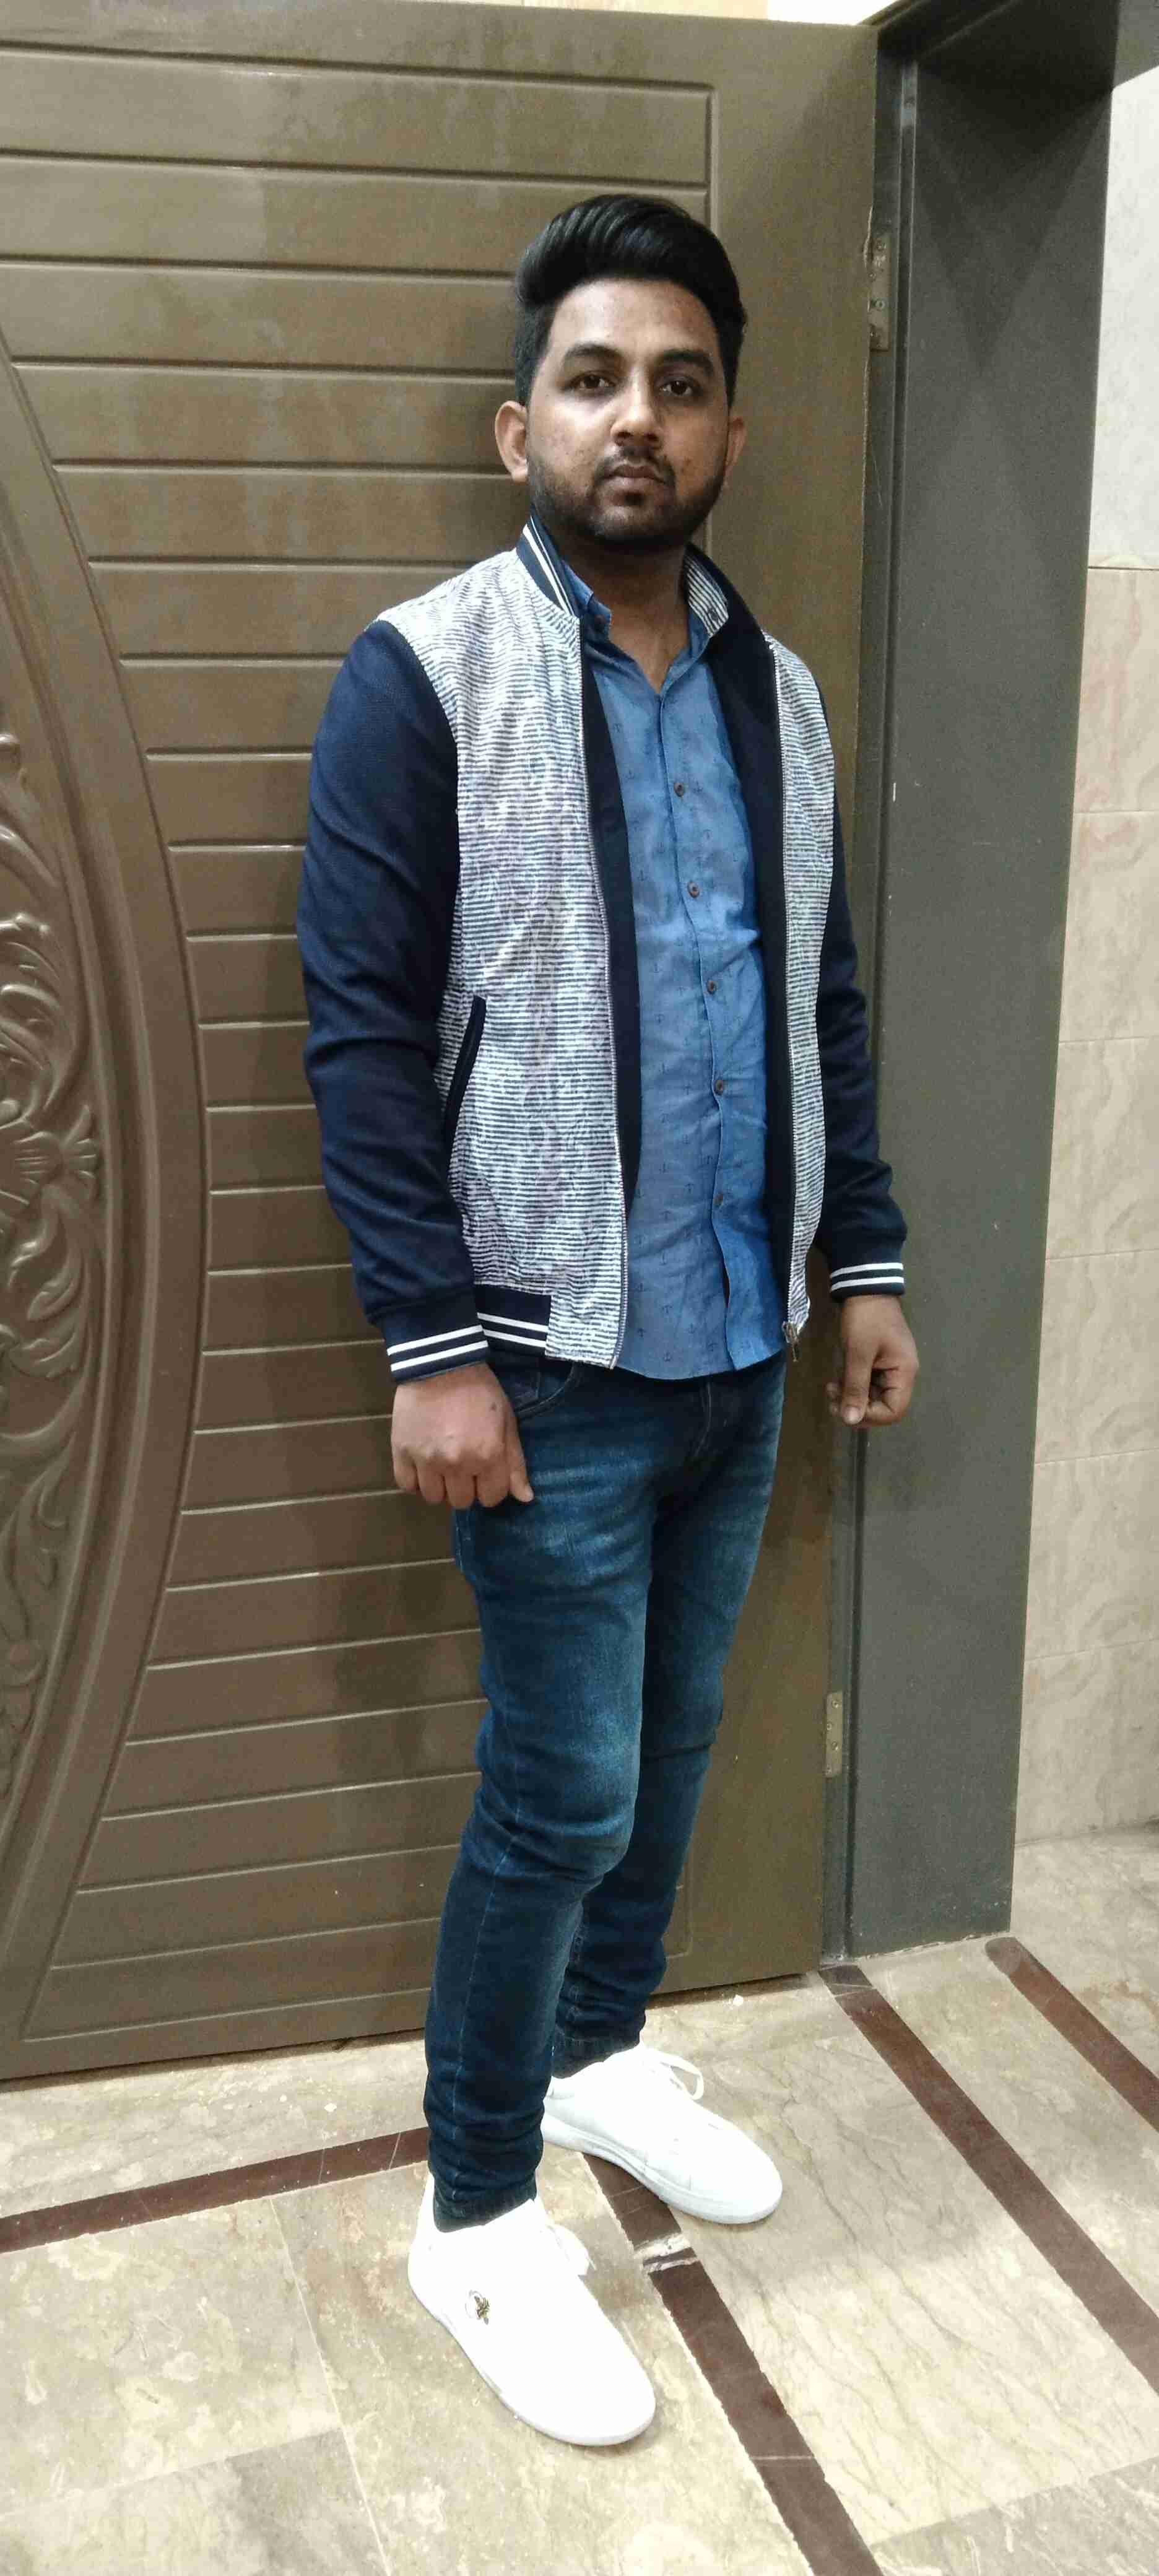 Naeem Ali